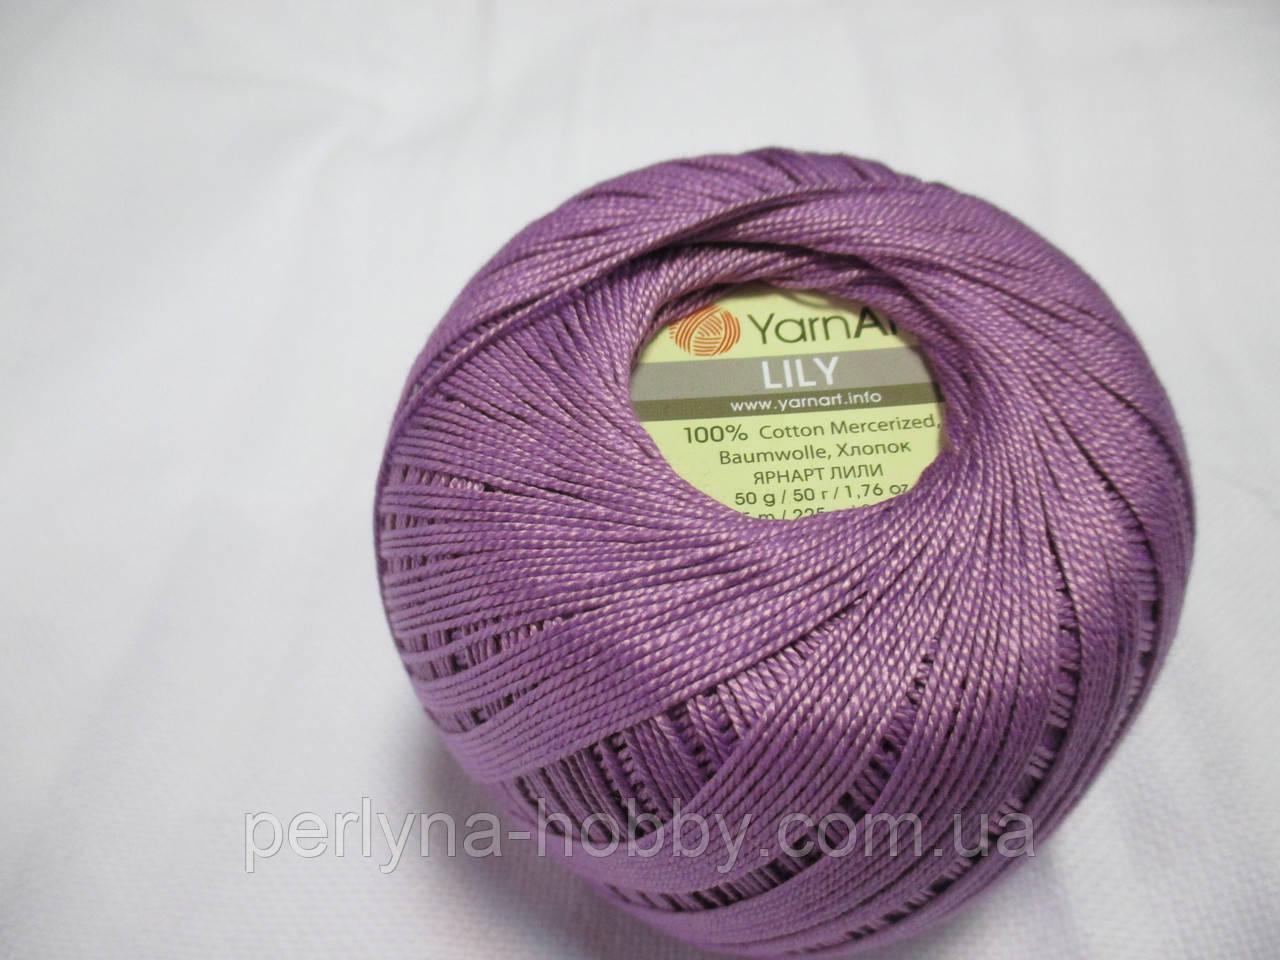 Пряжа Лілі Lily YarnArt 100% бавовна фіолетова № 6309